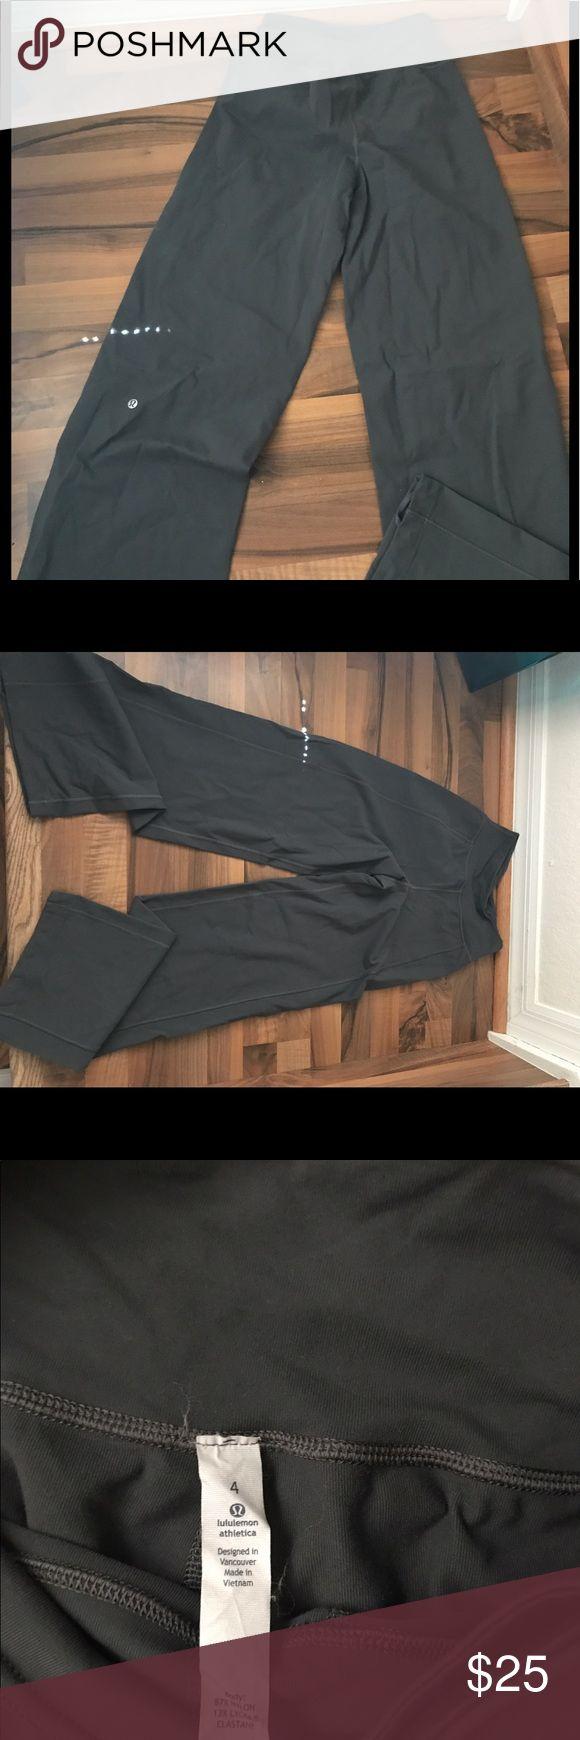 Lululemon pants Only worn once! lululemon athletica Pants